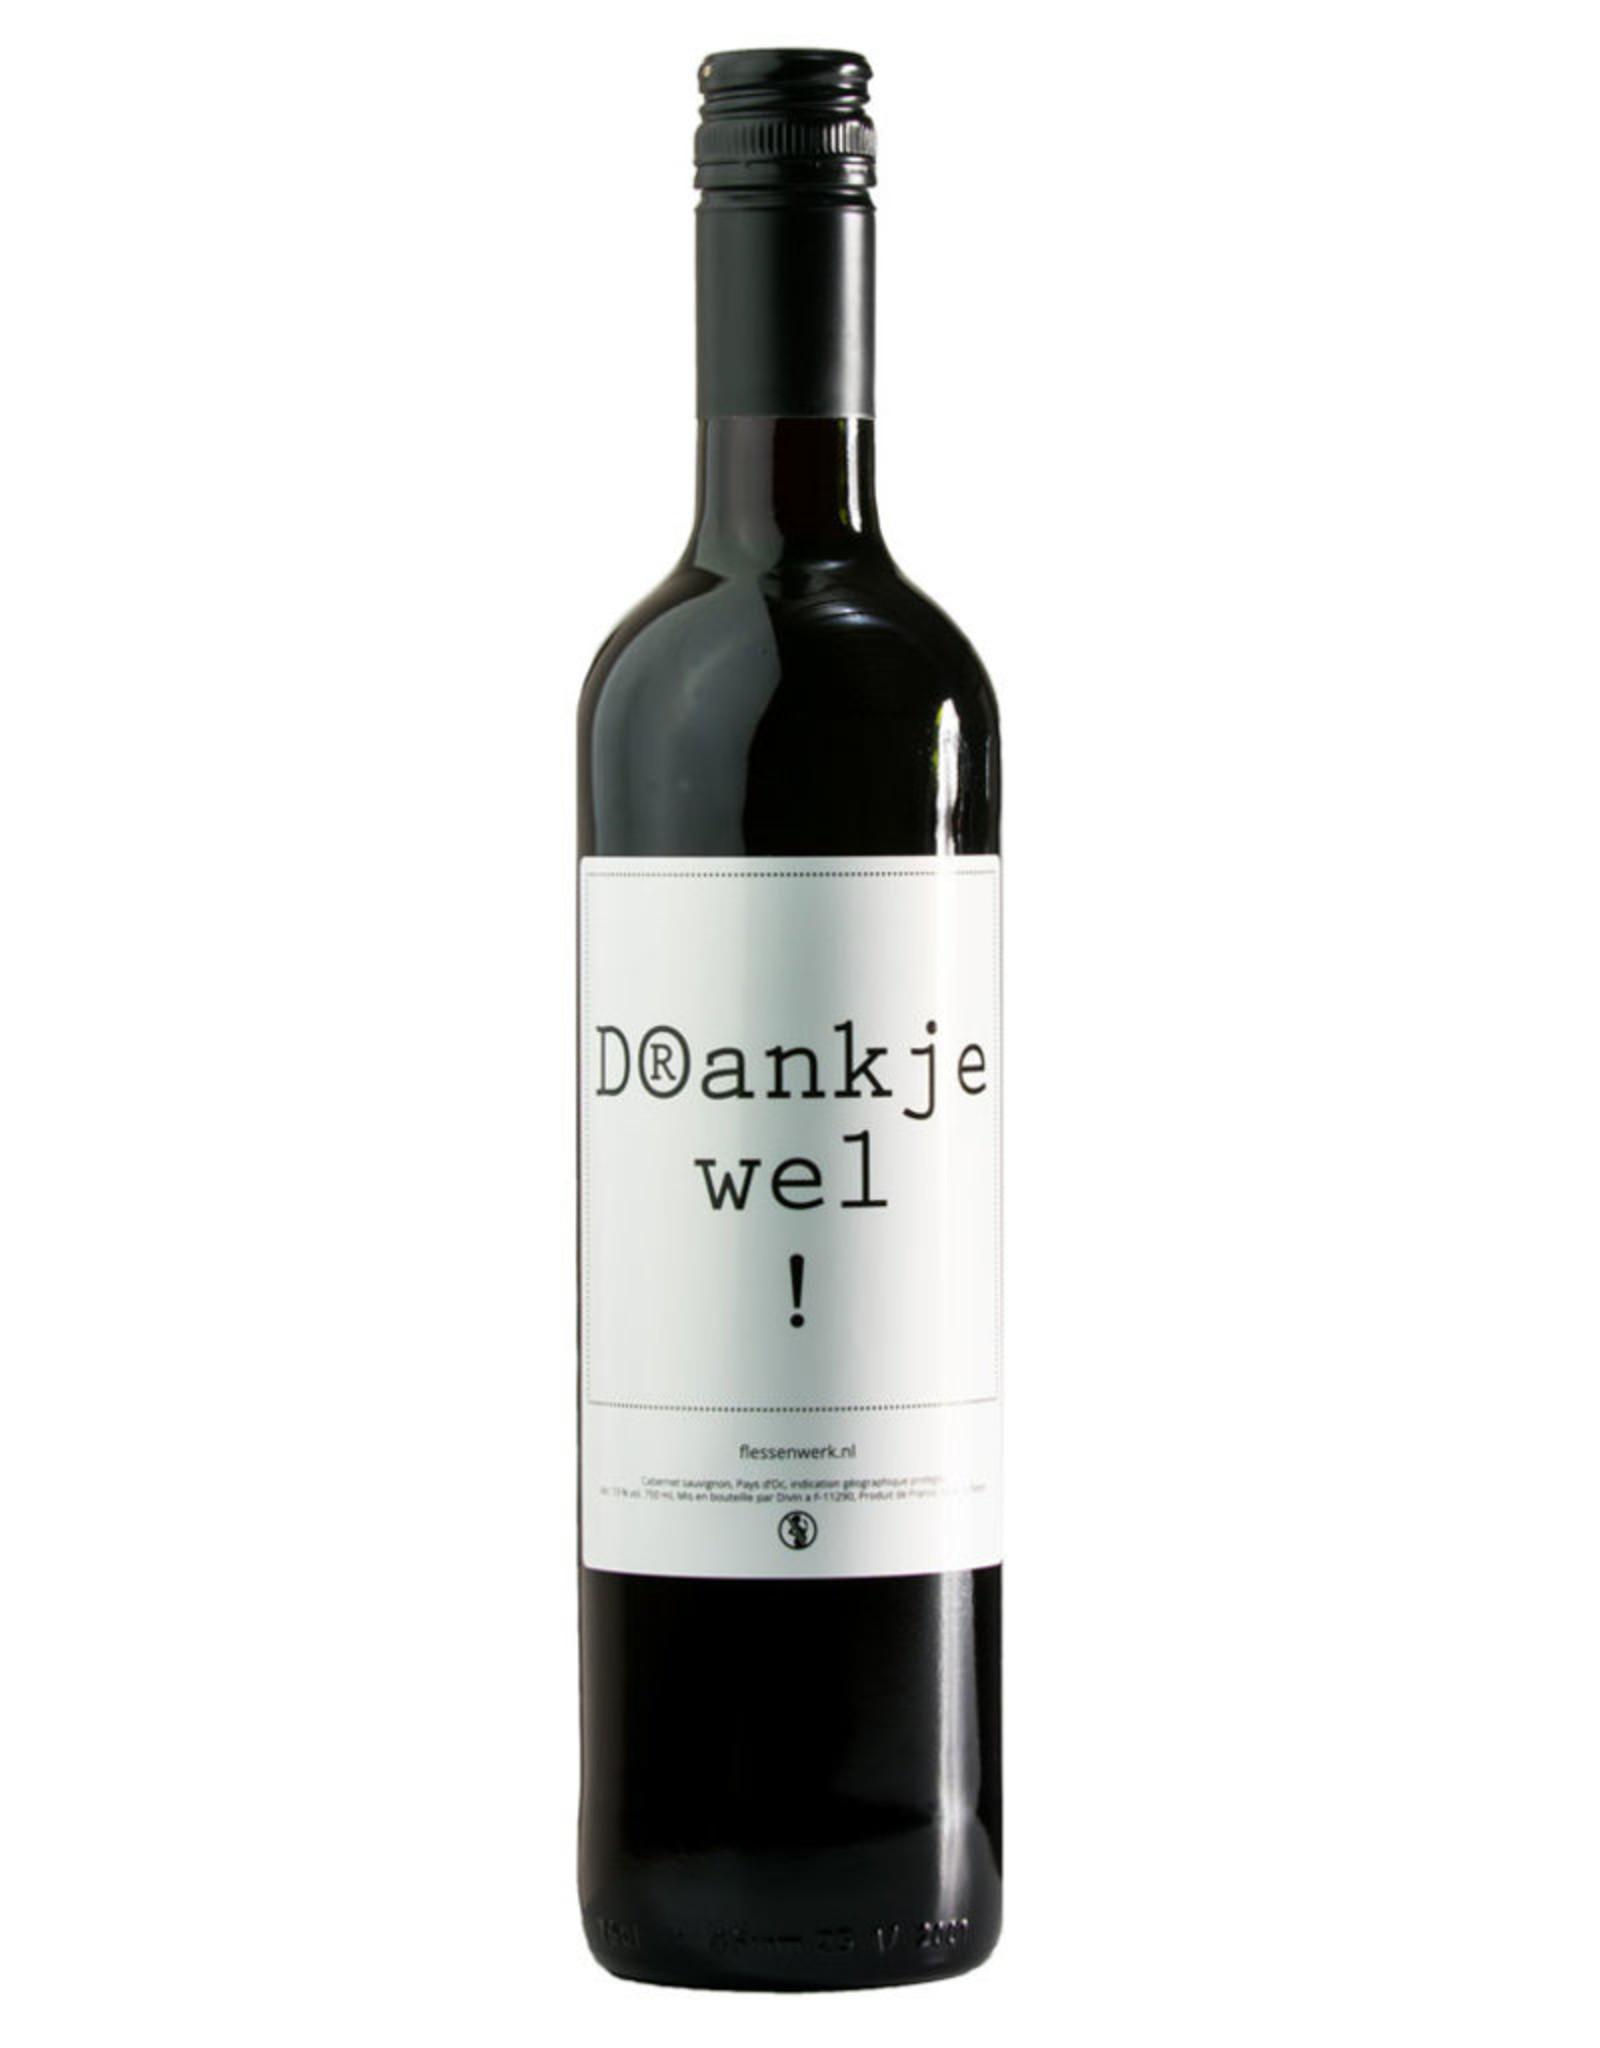 Drankjewel wijn